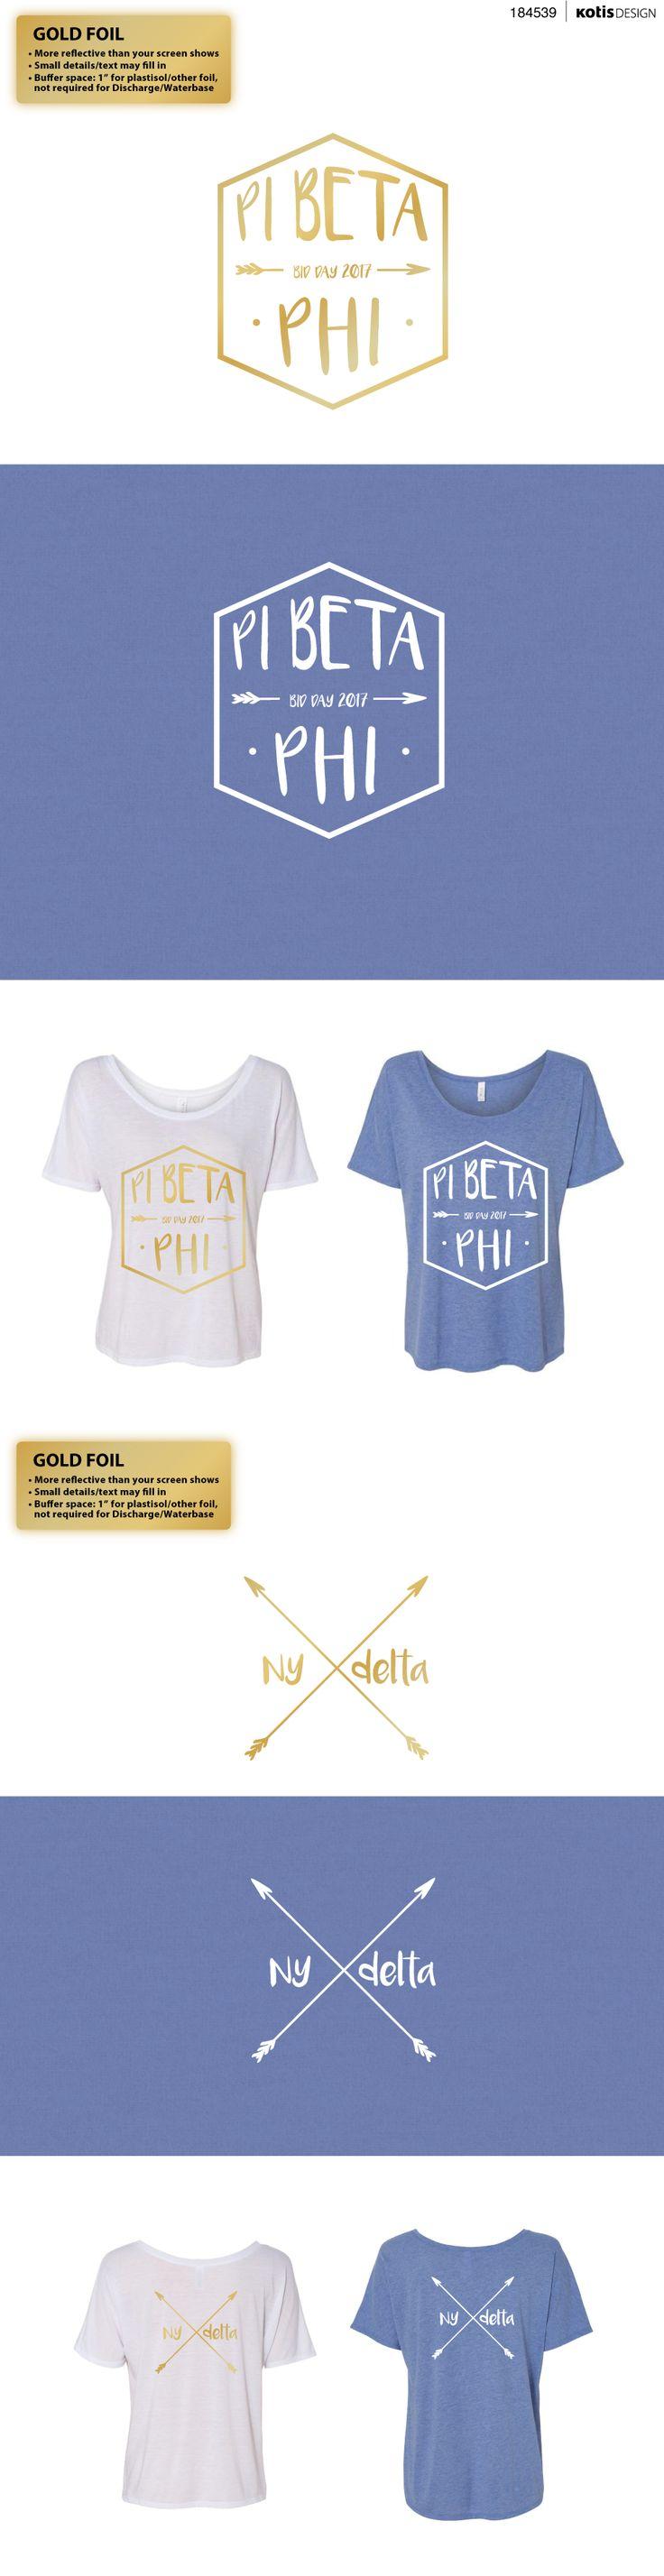 184539 - Cornell Pi Phi   Bid Day Shirts '17 - View Proof - Kotis Design